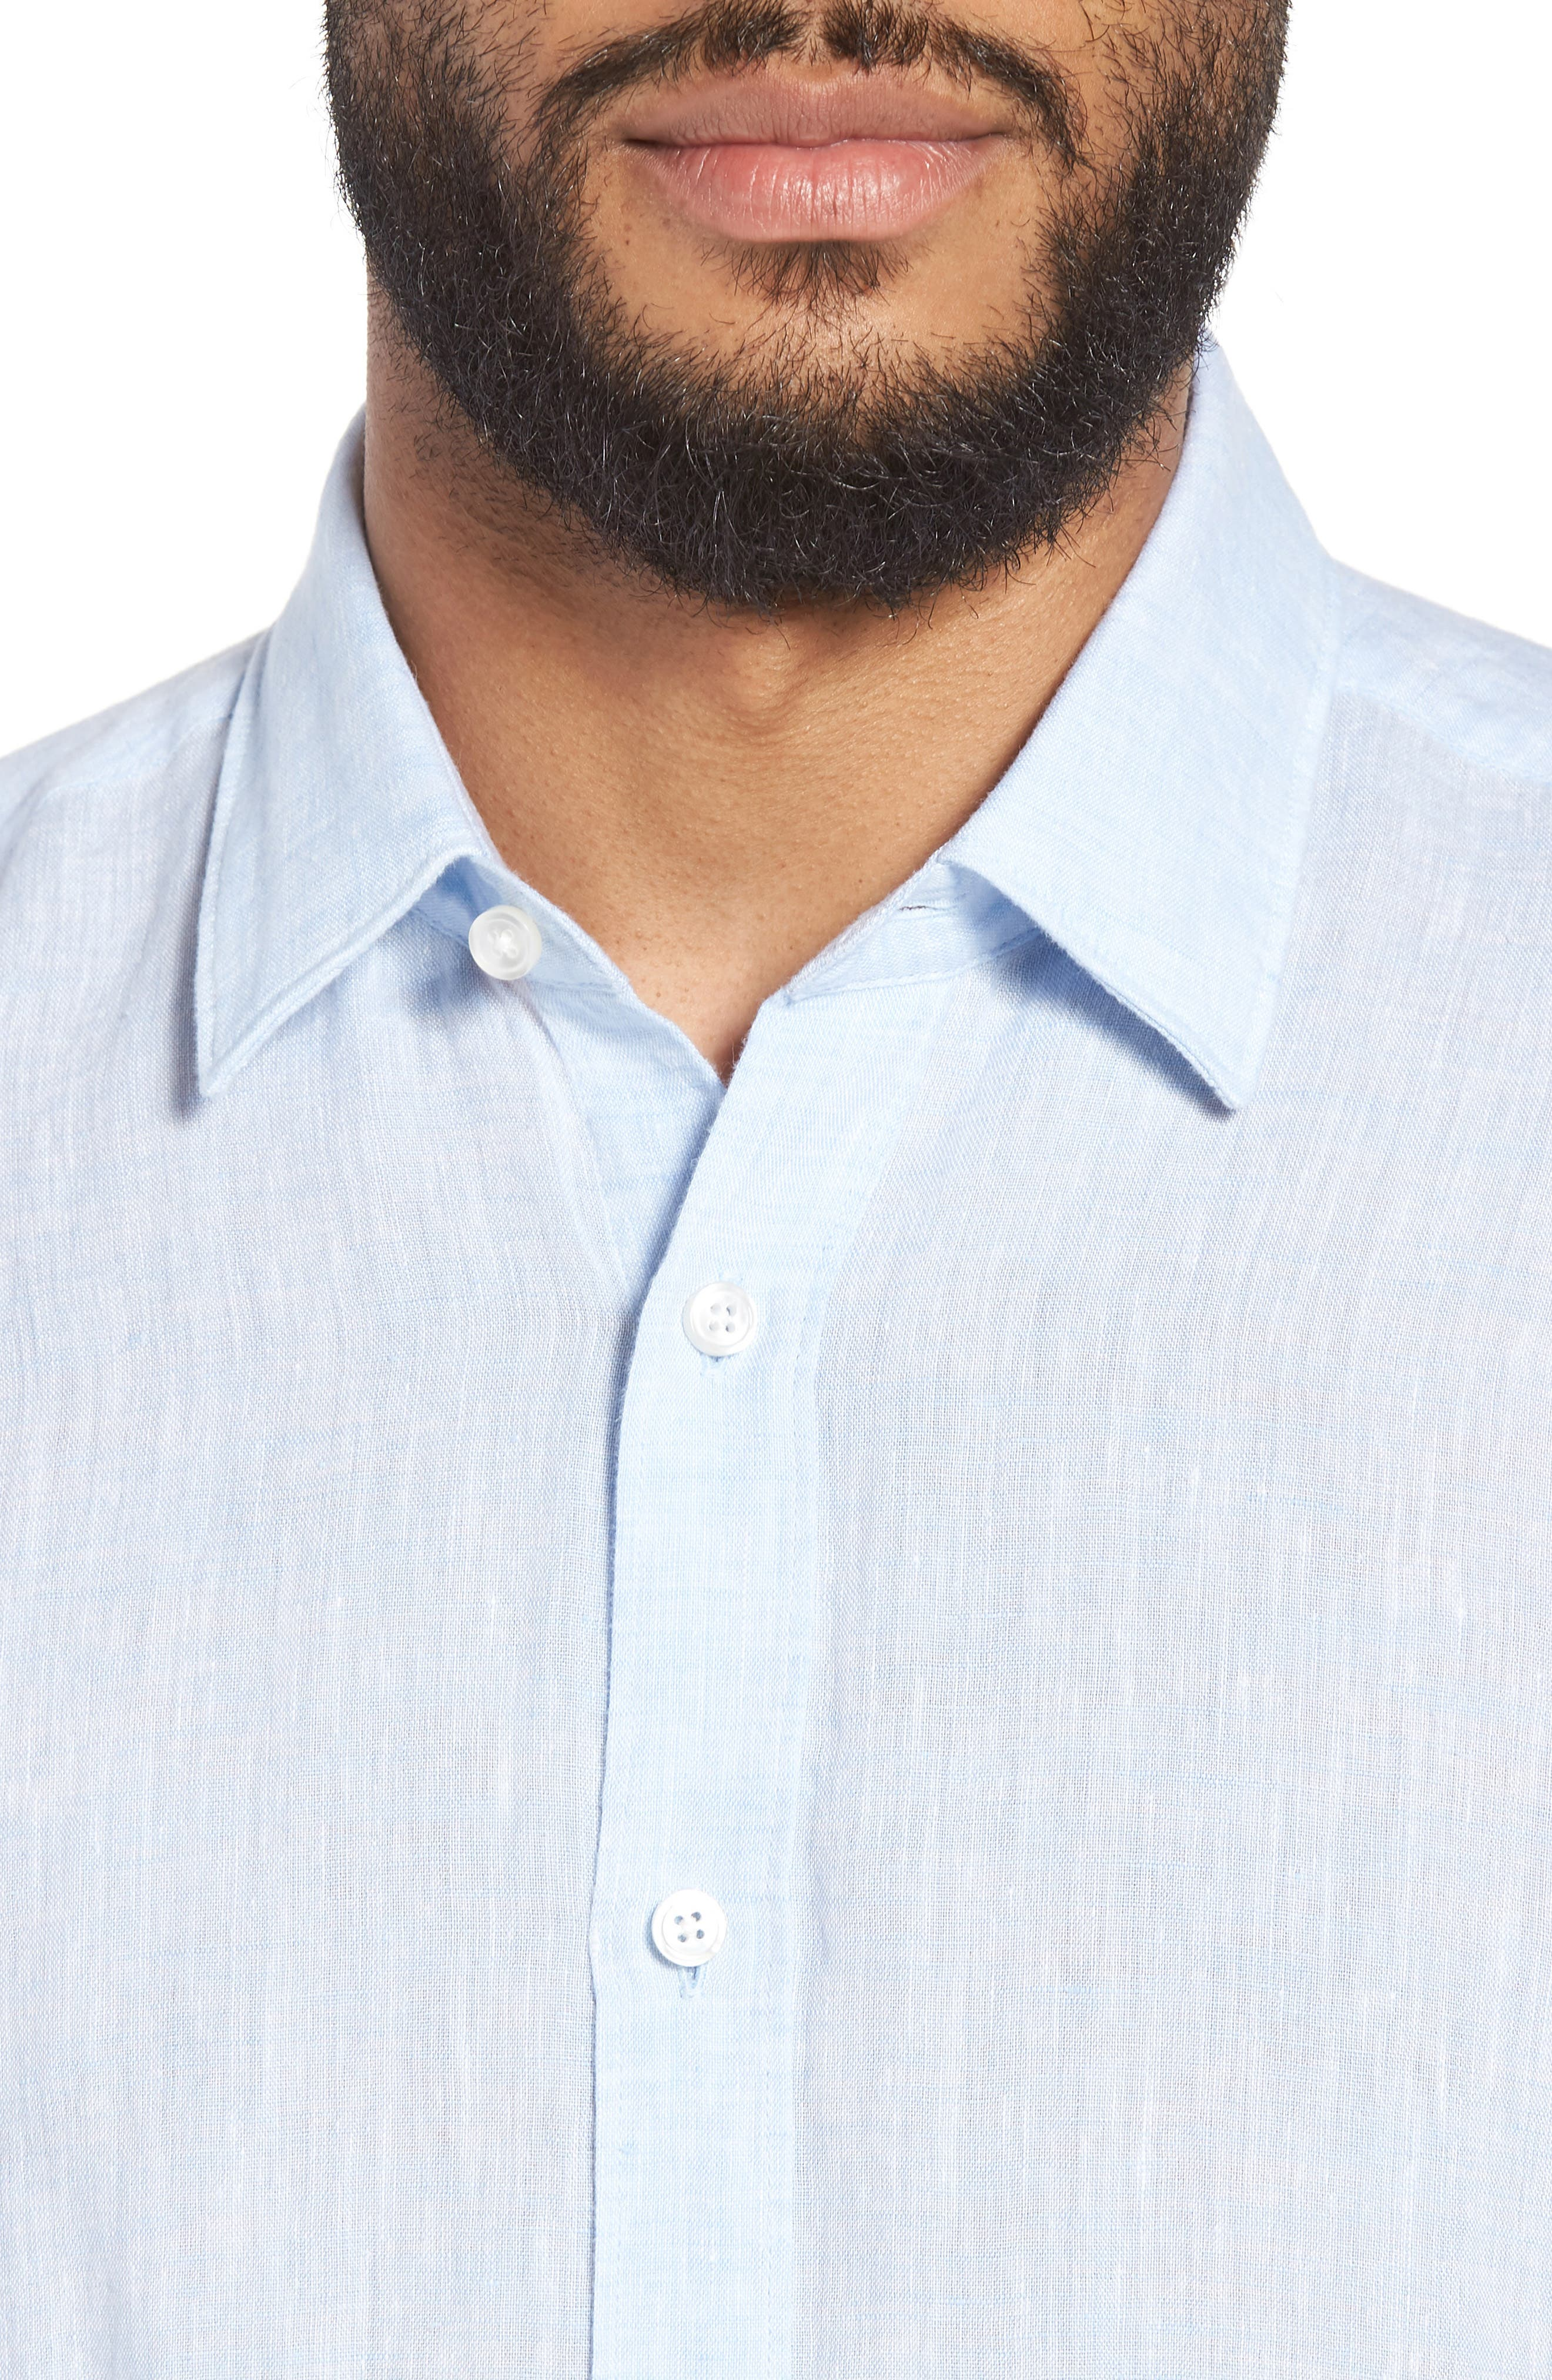 Luka Slim Fit Sport Shirt,                             Alternate thumbnail 2, color,                             Blue